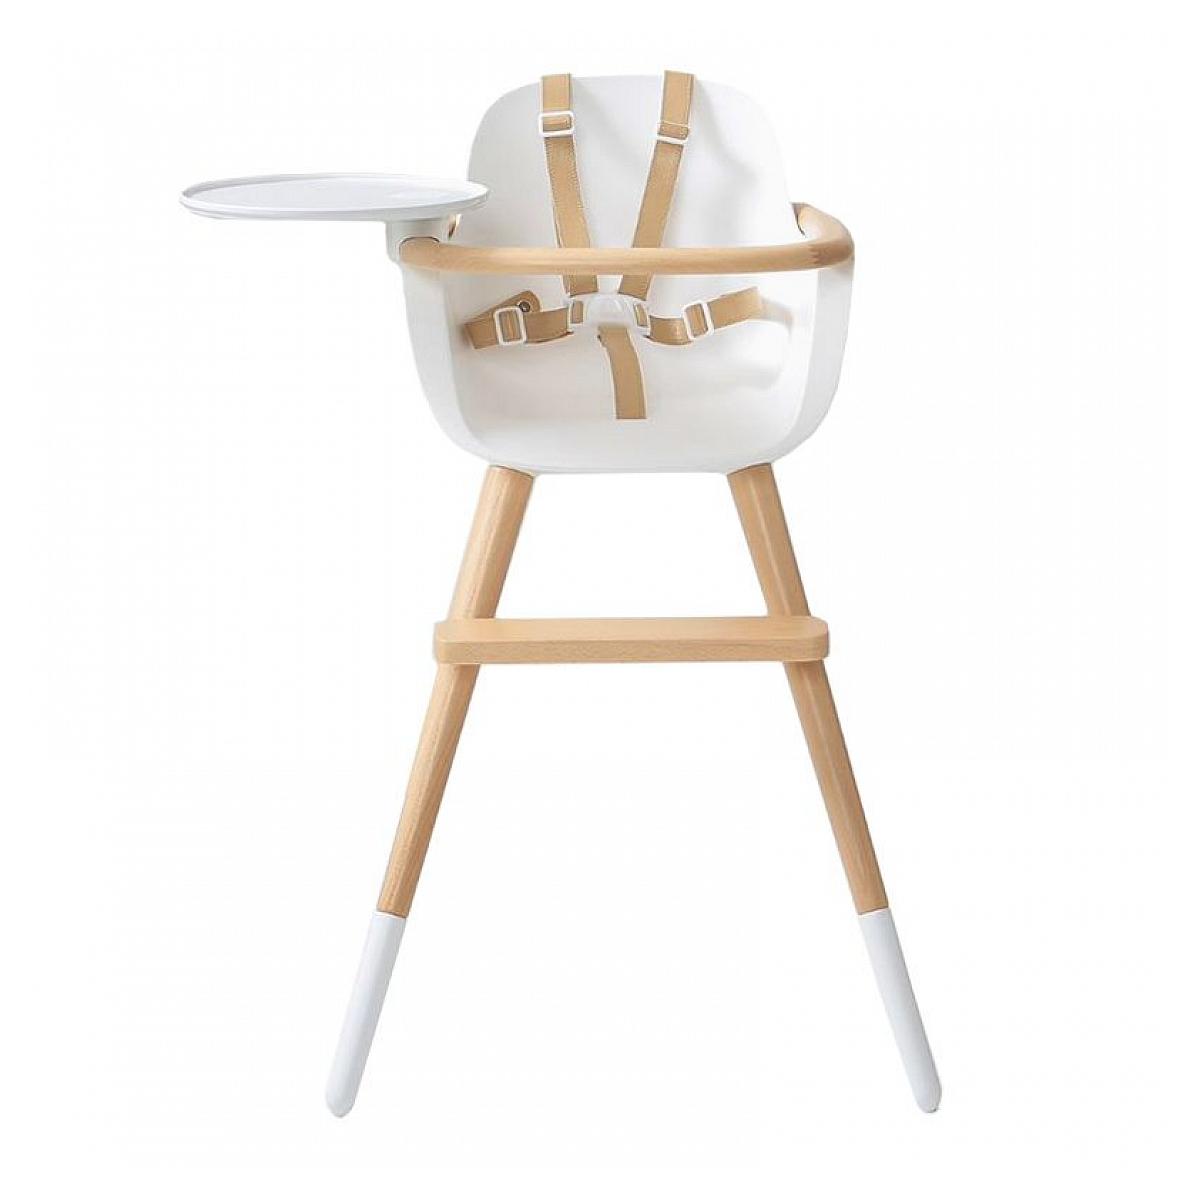 Micuna - Chaise haute blanche et similicuir beige Ovo Original